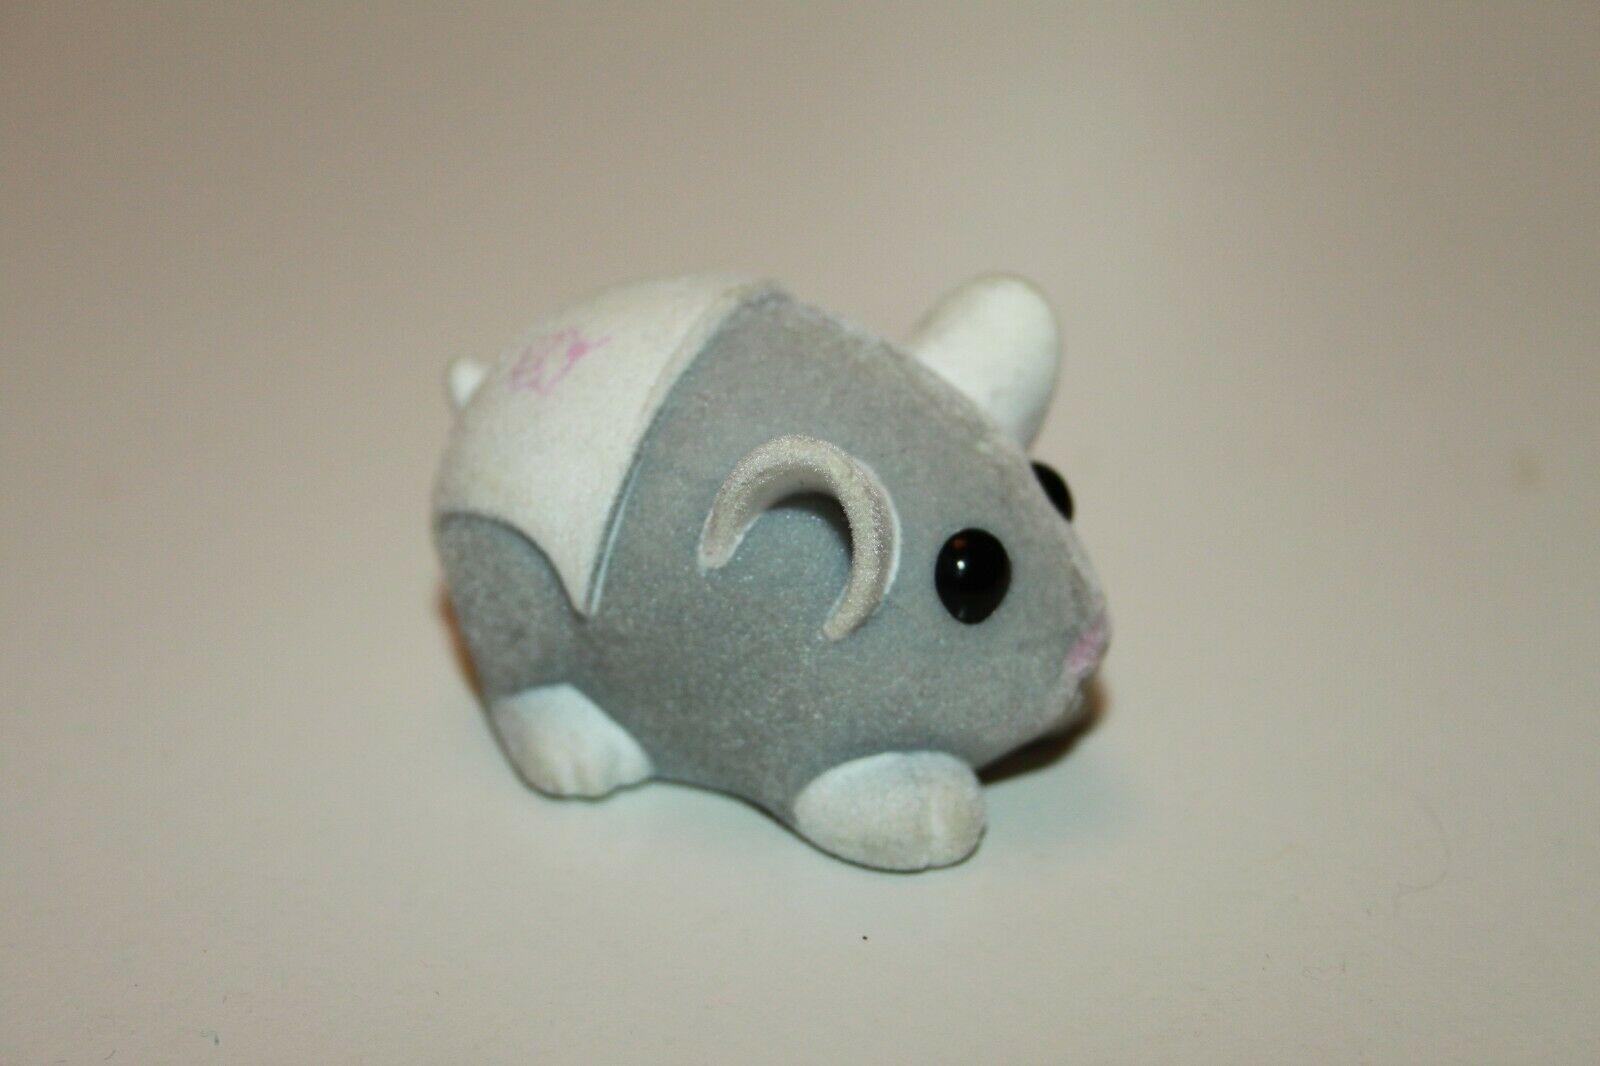 2 X Zhu Zhu Pets Hamster Babies Grey White Diaper Baby Cakes Orange Blue Peanut Ebay Baby Diapers Hamster Pets